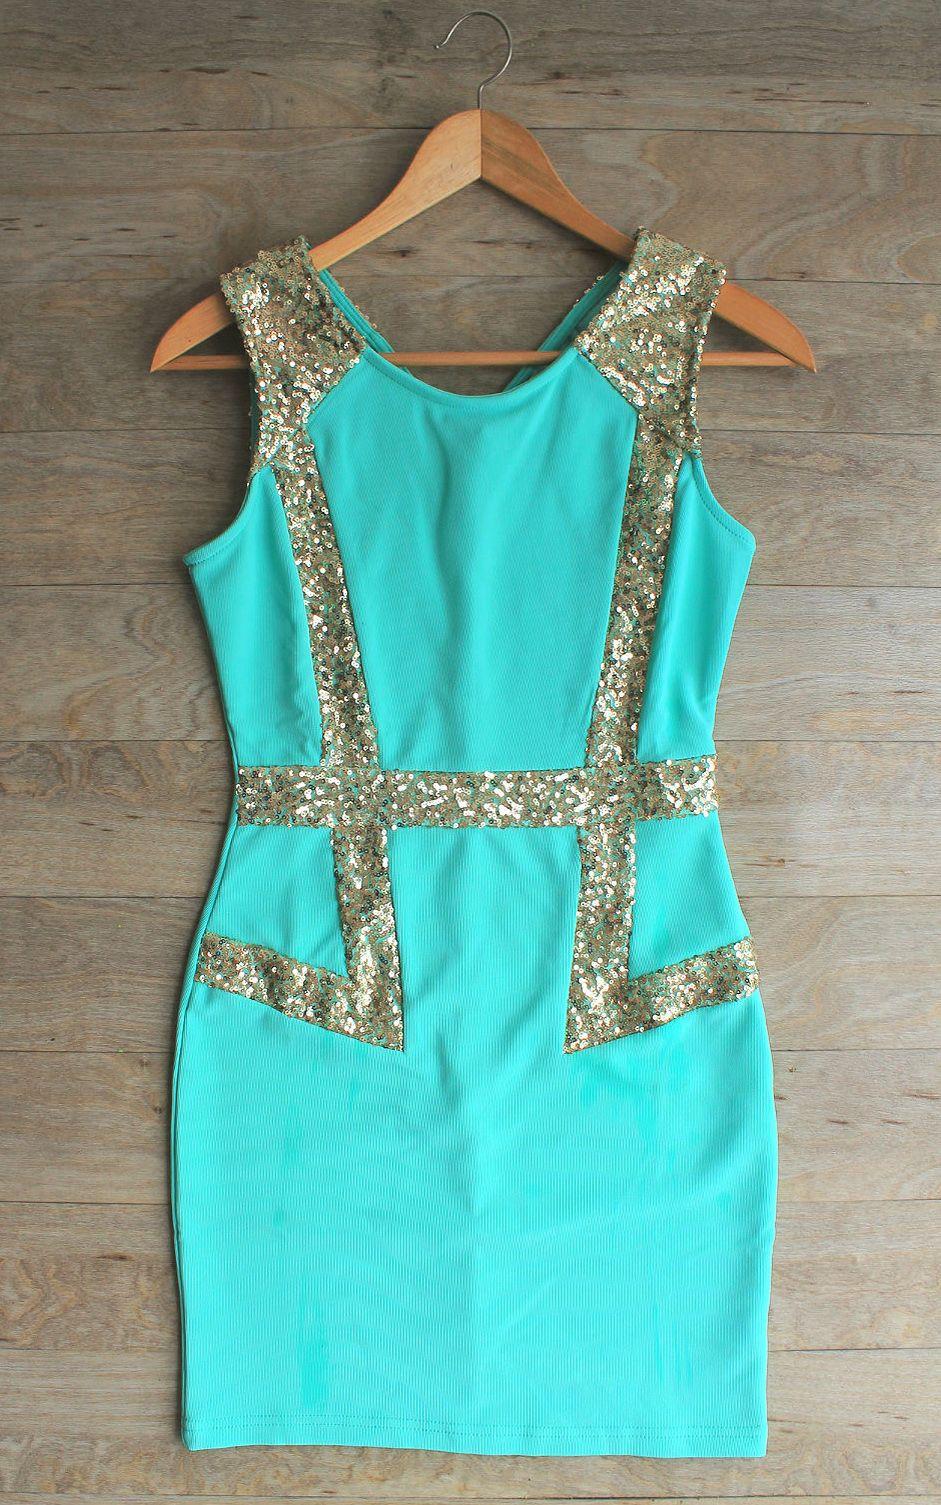 3blue dress Street Style Teen fashion Cute Dress! Clothes Casual ...